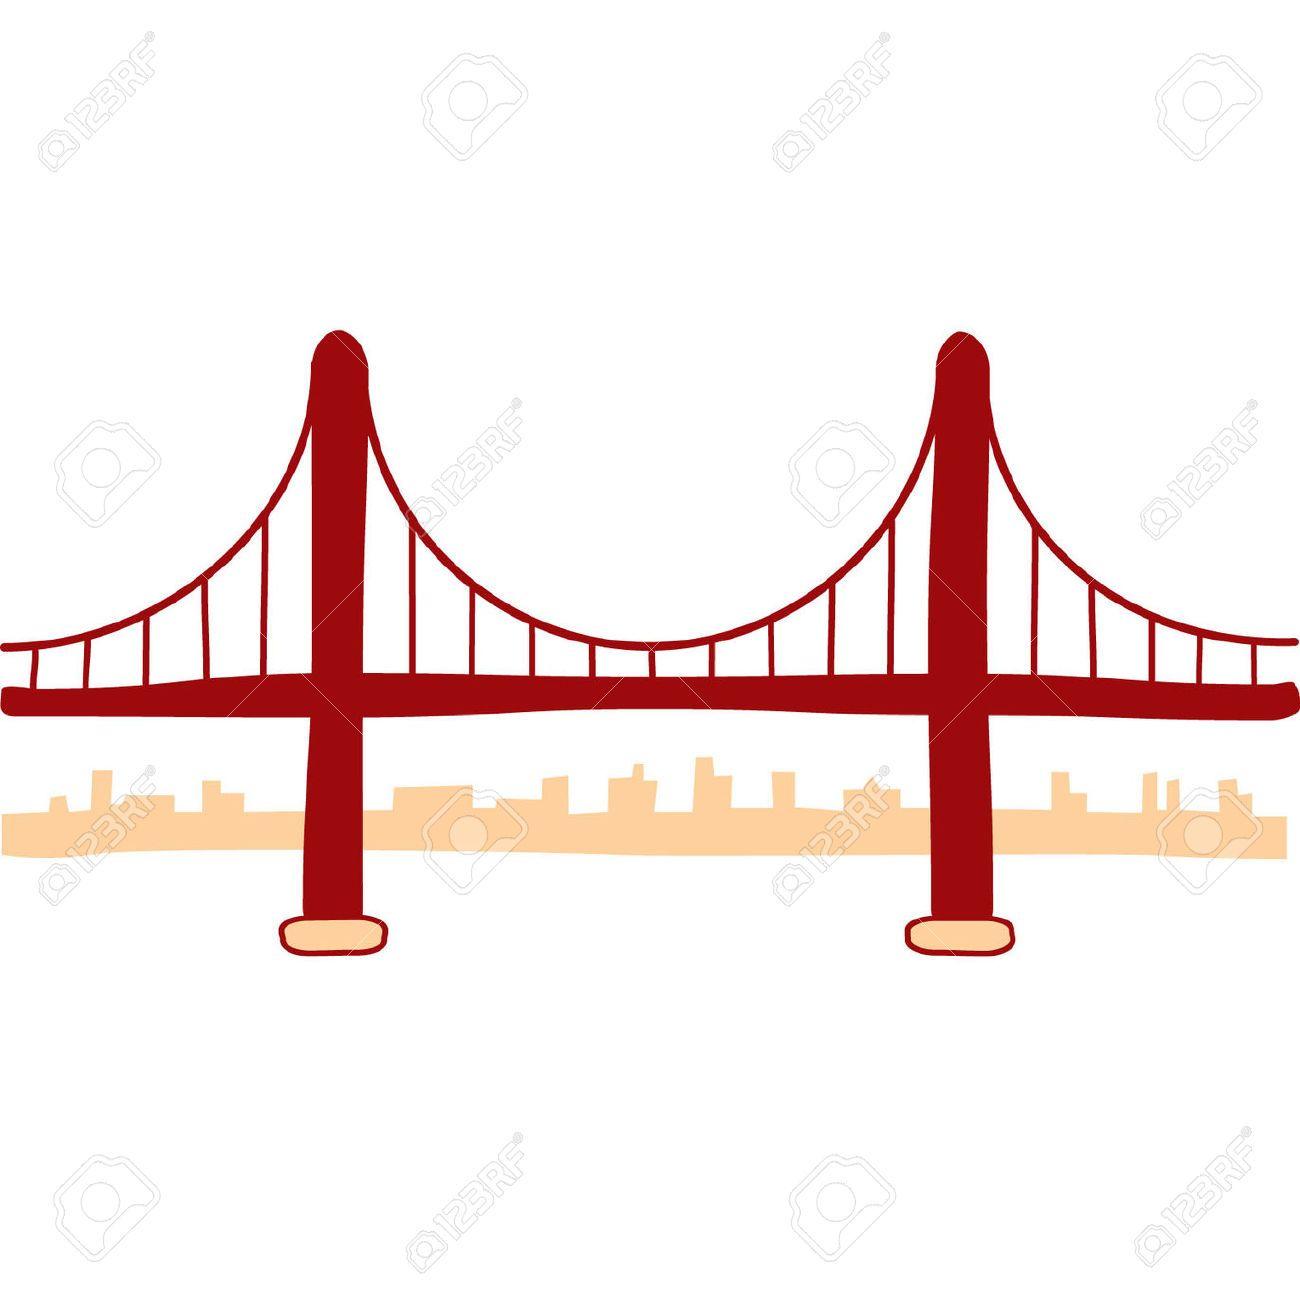 Printable coloring pages golden gate bridge - Golden Gate Bridge Outline Google Search